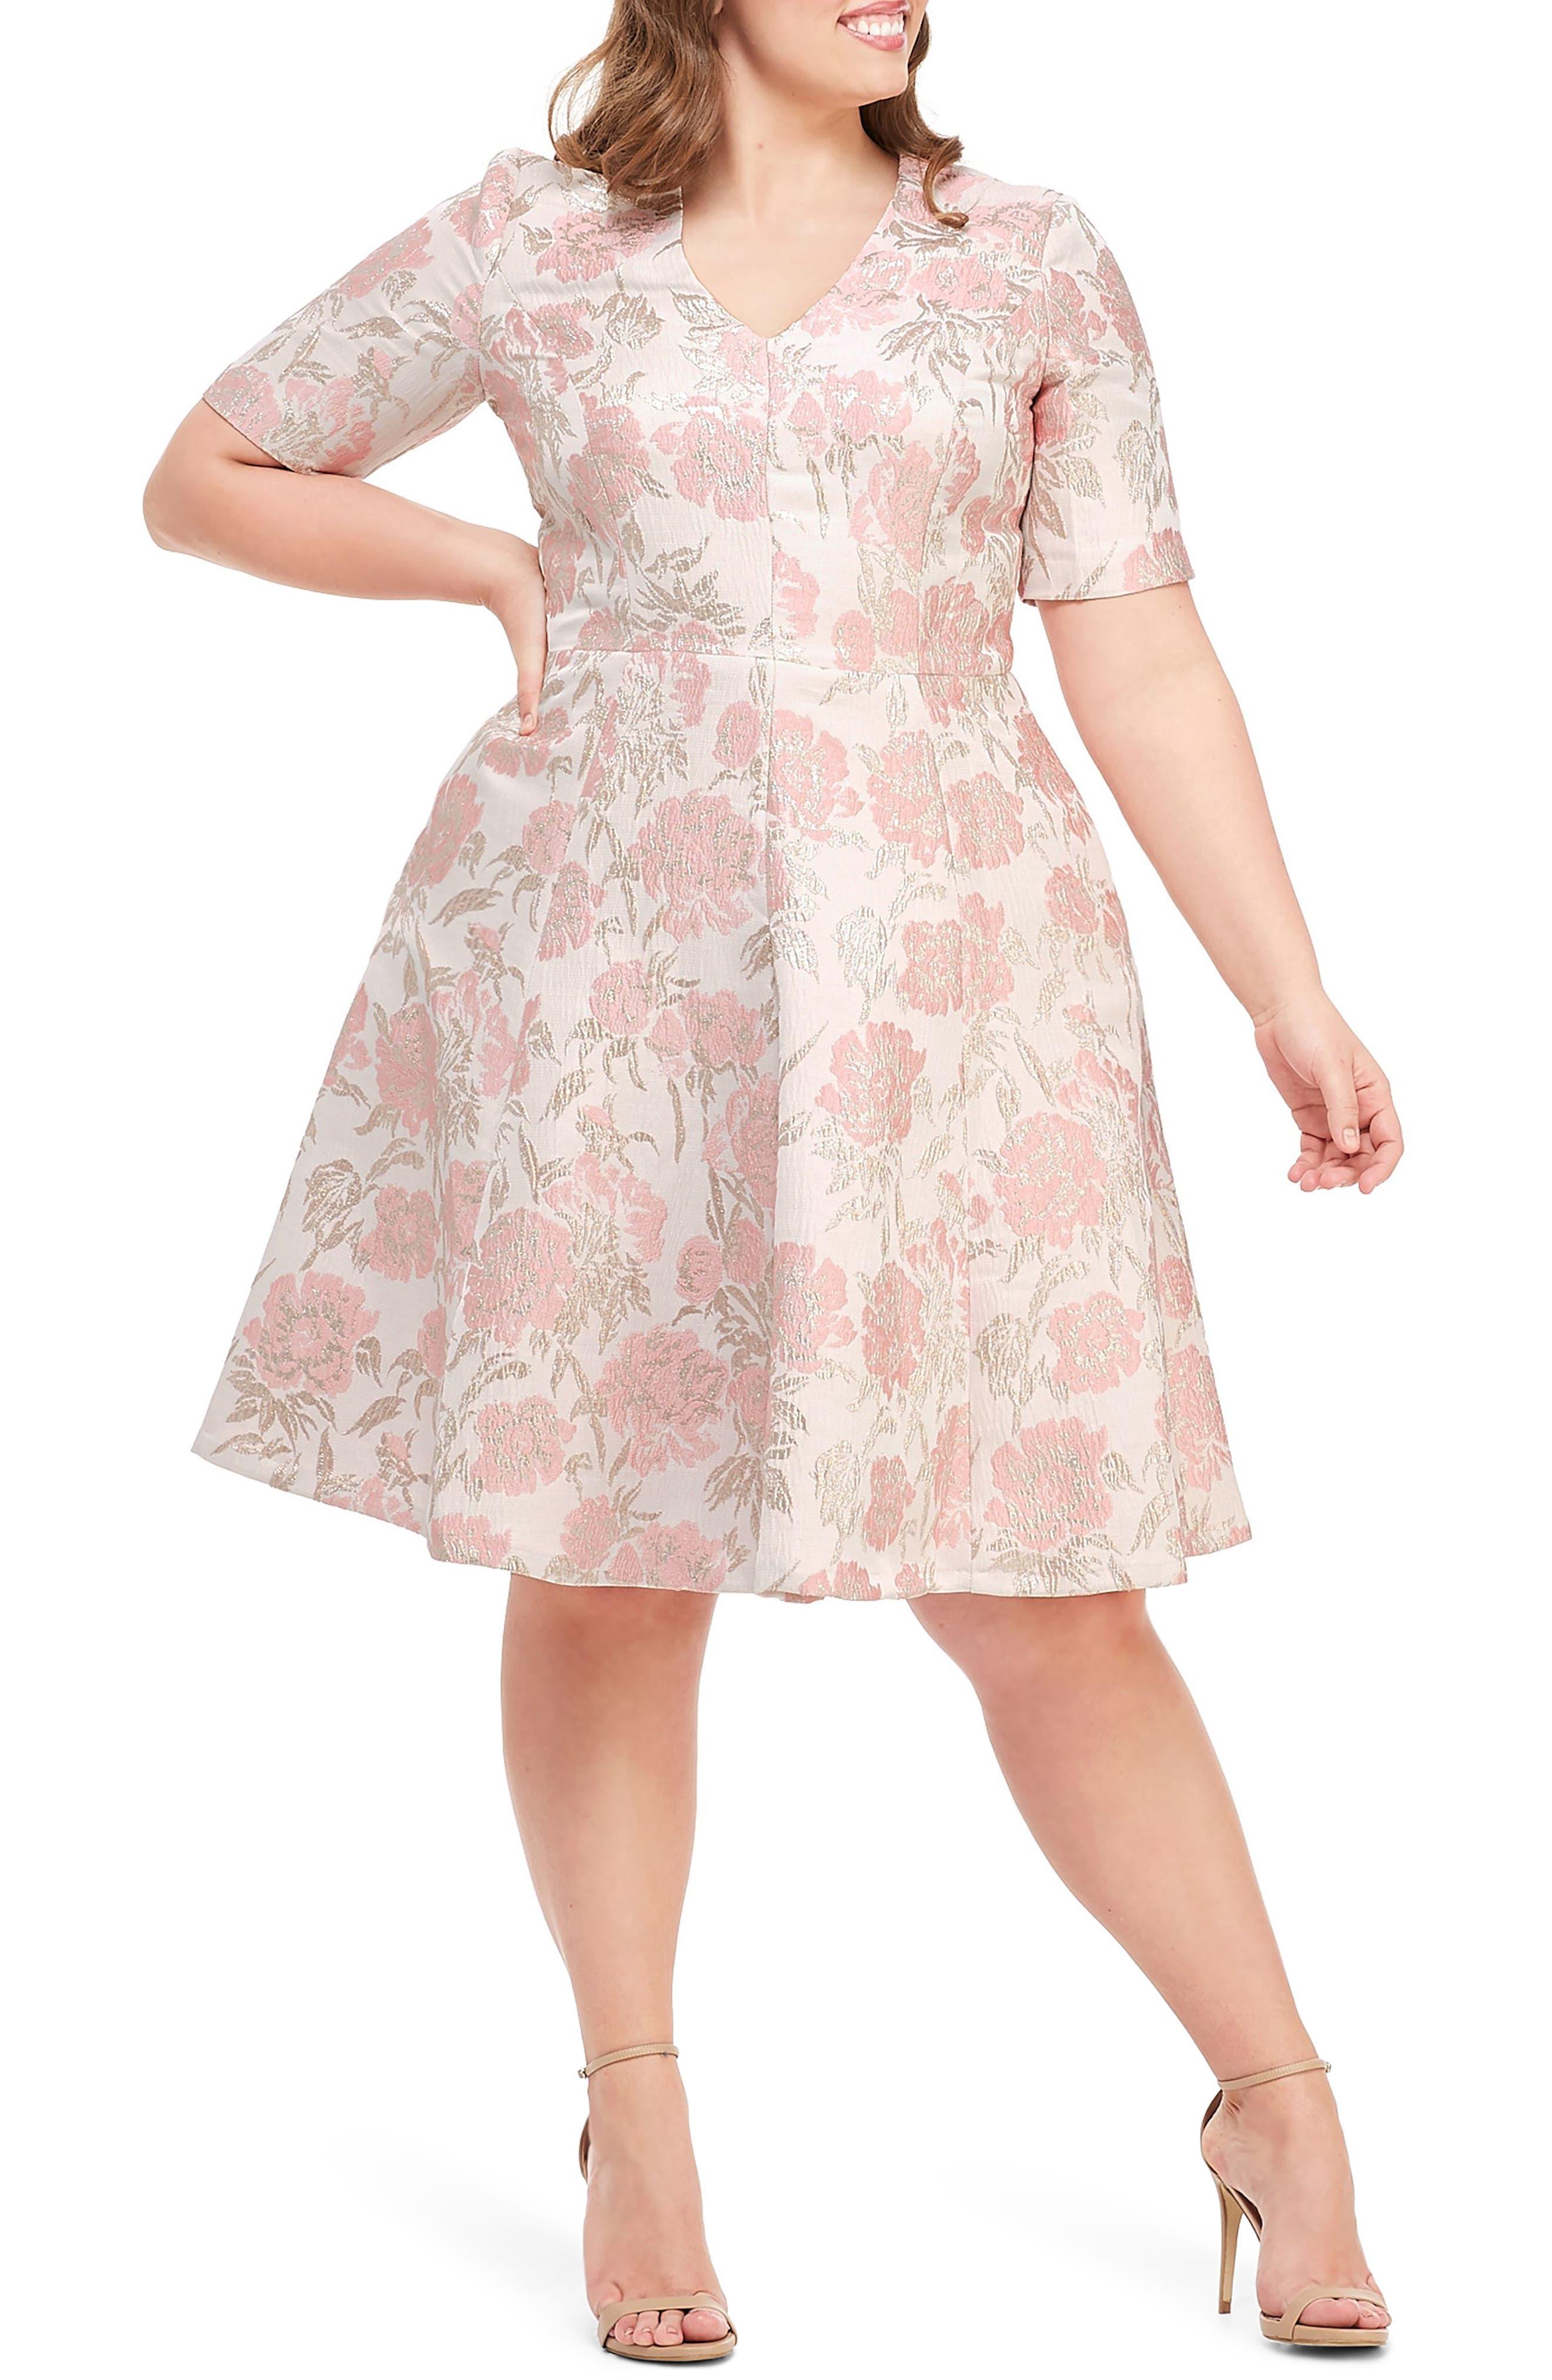 Adair Pink Passion Rose Jacquard Fit & Flare Dress,                             Alternate thumbnail 2, color,                             PINK PEARL